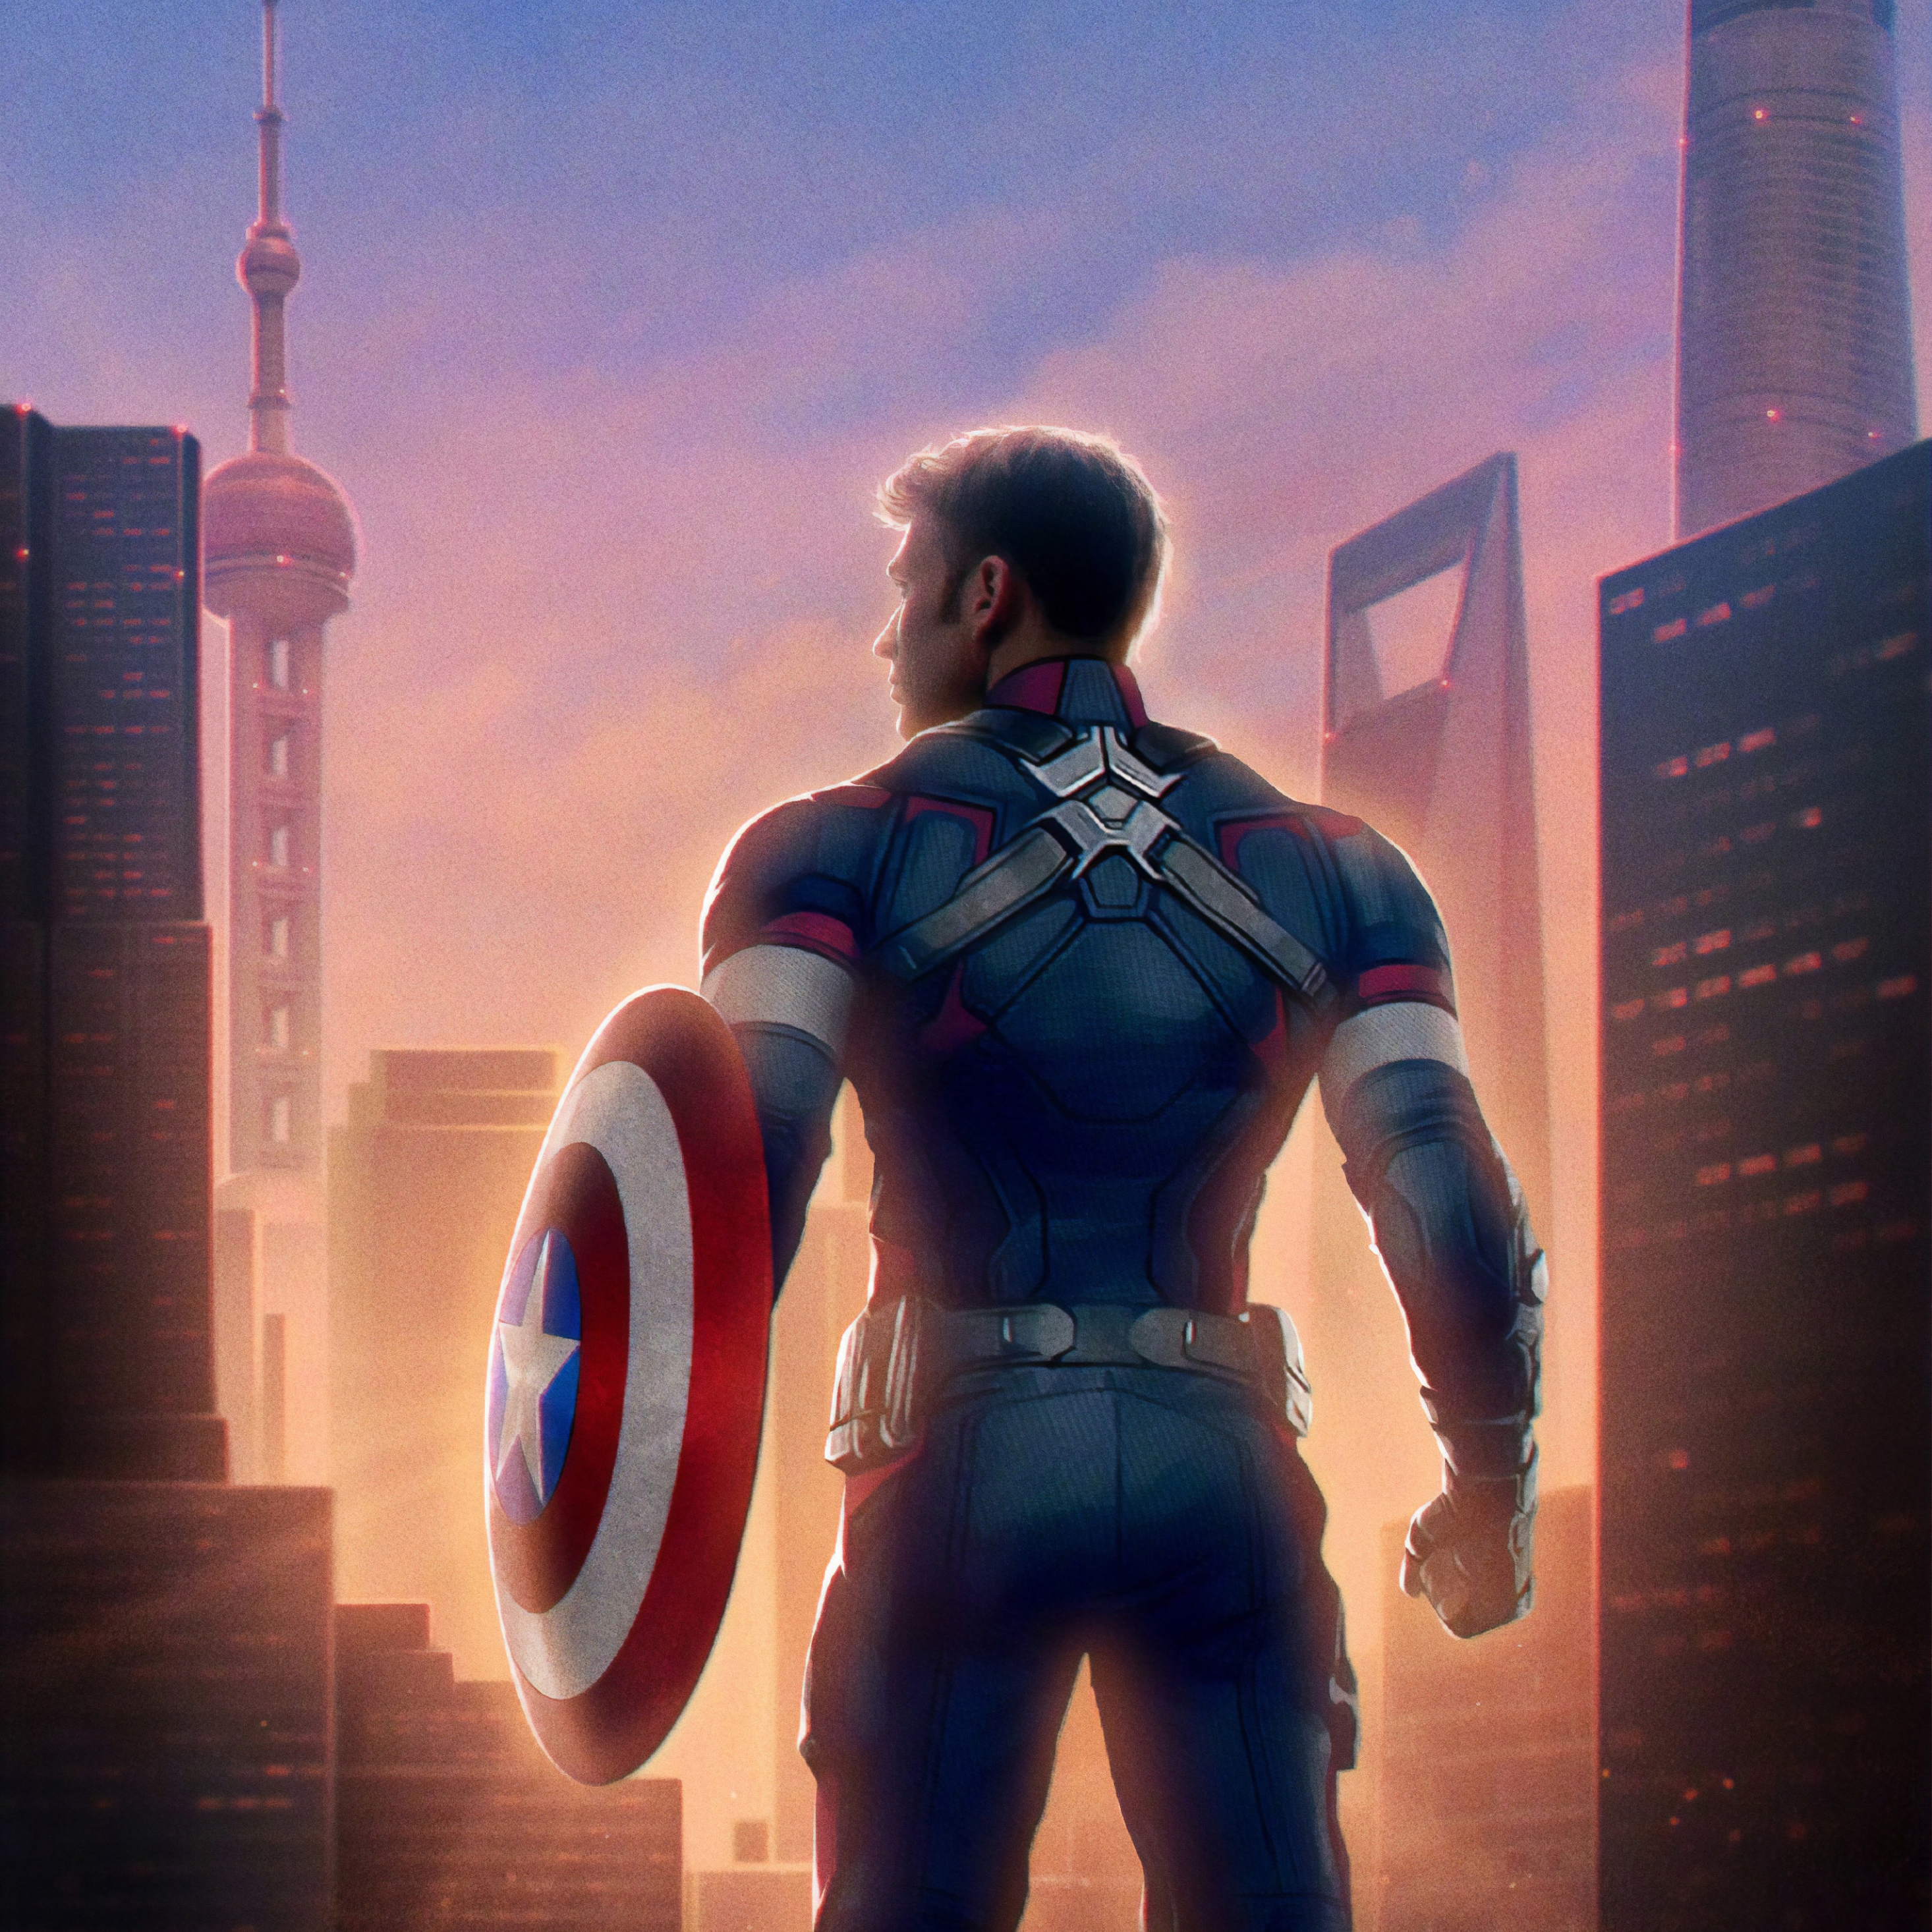 2932x2932 Captain America Avengers Endgame Ipad Pro Retina